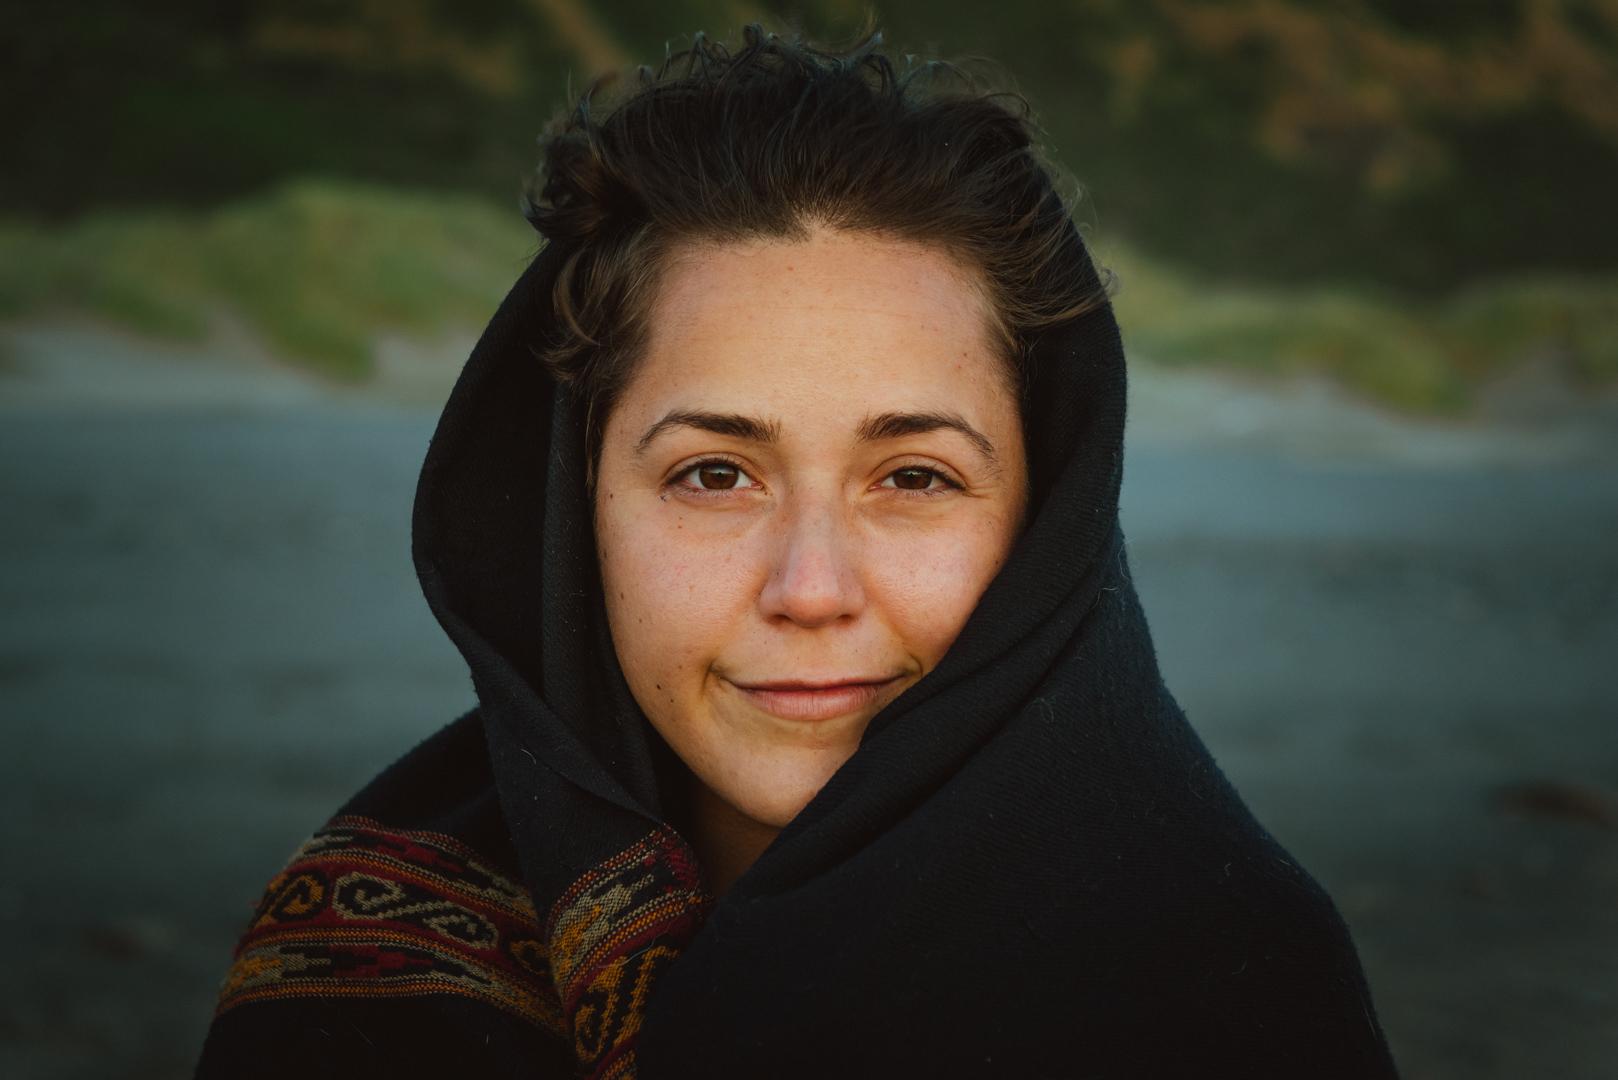 portrait woman outside closeup